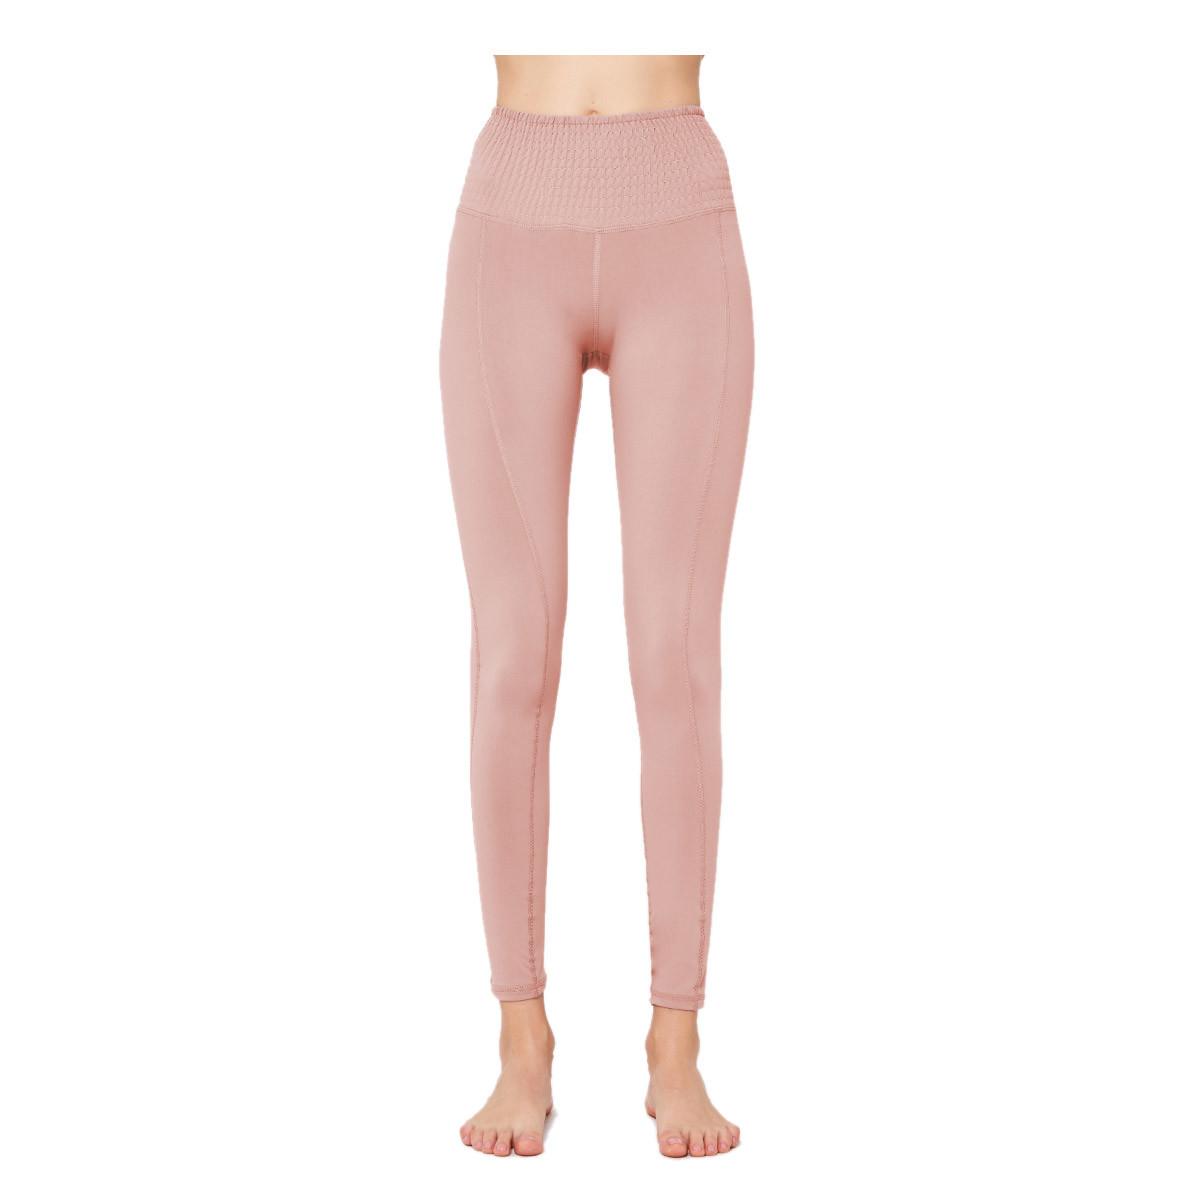 High Quality Gym Leggings High Waisted Fitness Pants